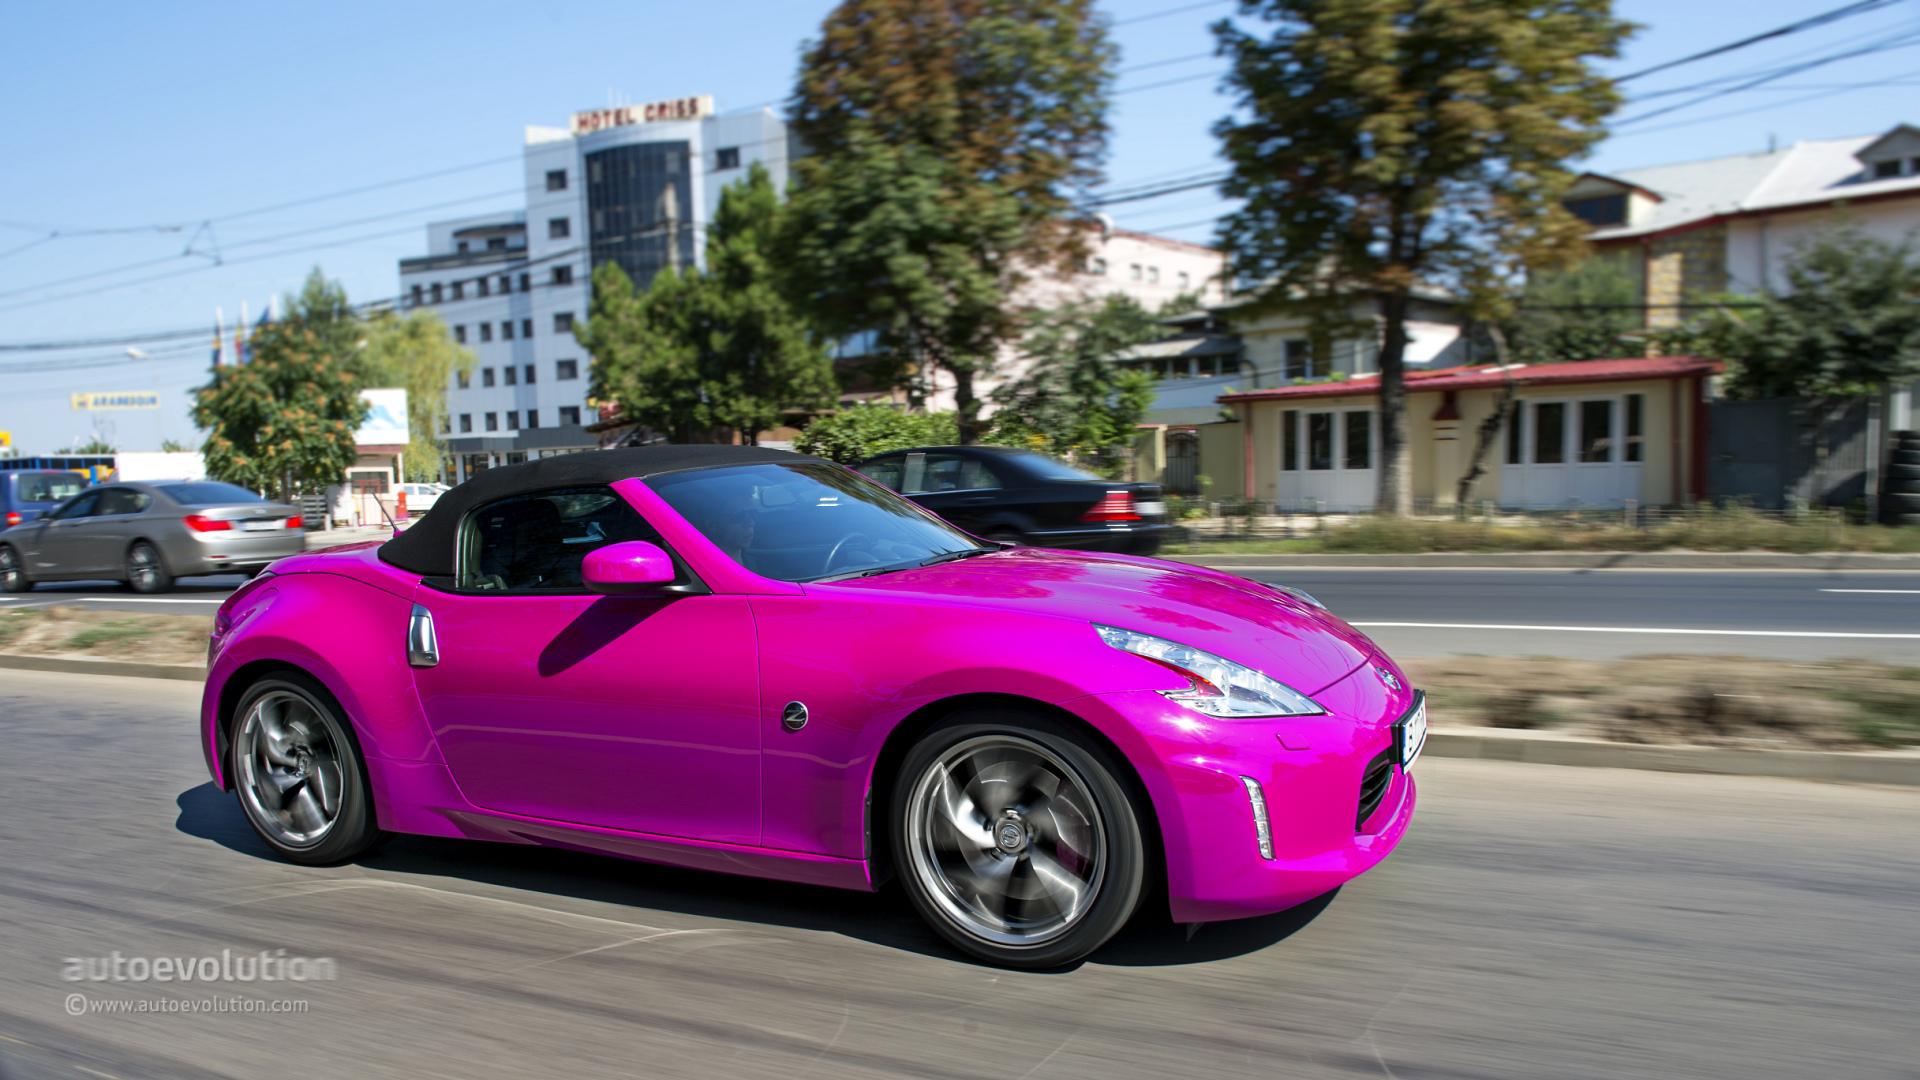 2014 nissan 370z roadster review autoevolution